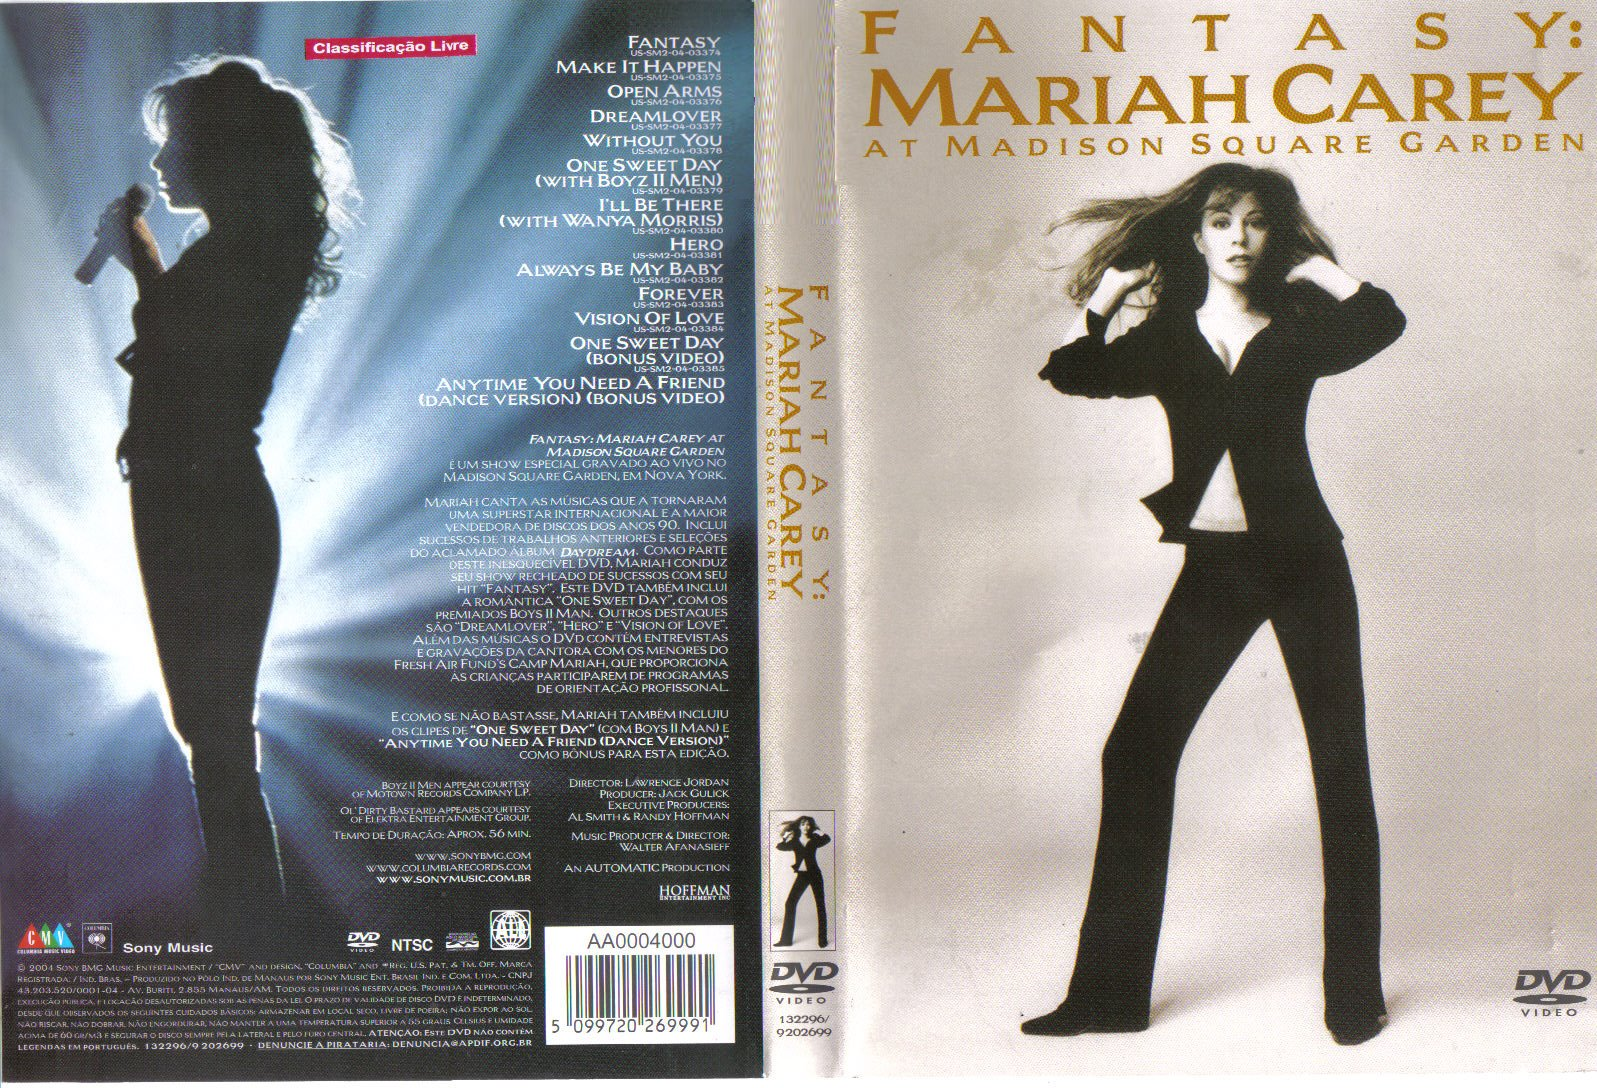 http://4.bp.blogspot.com/_brcl7Spzbn4/S-w7qjobKhI/AAAAAAAAAPo/V0M3EgNo3c8/s1600/Mariah+Carey+-+Fantasy.jpg